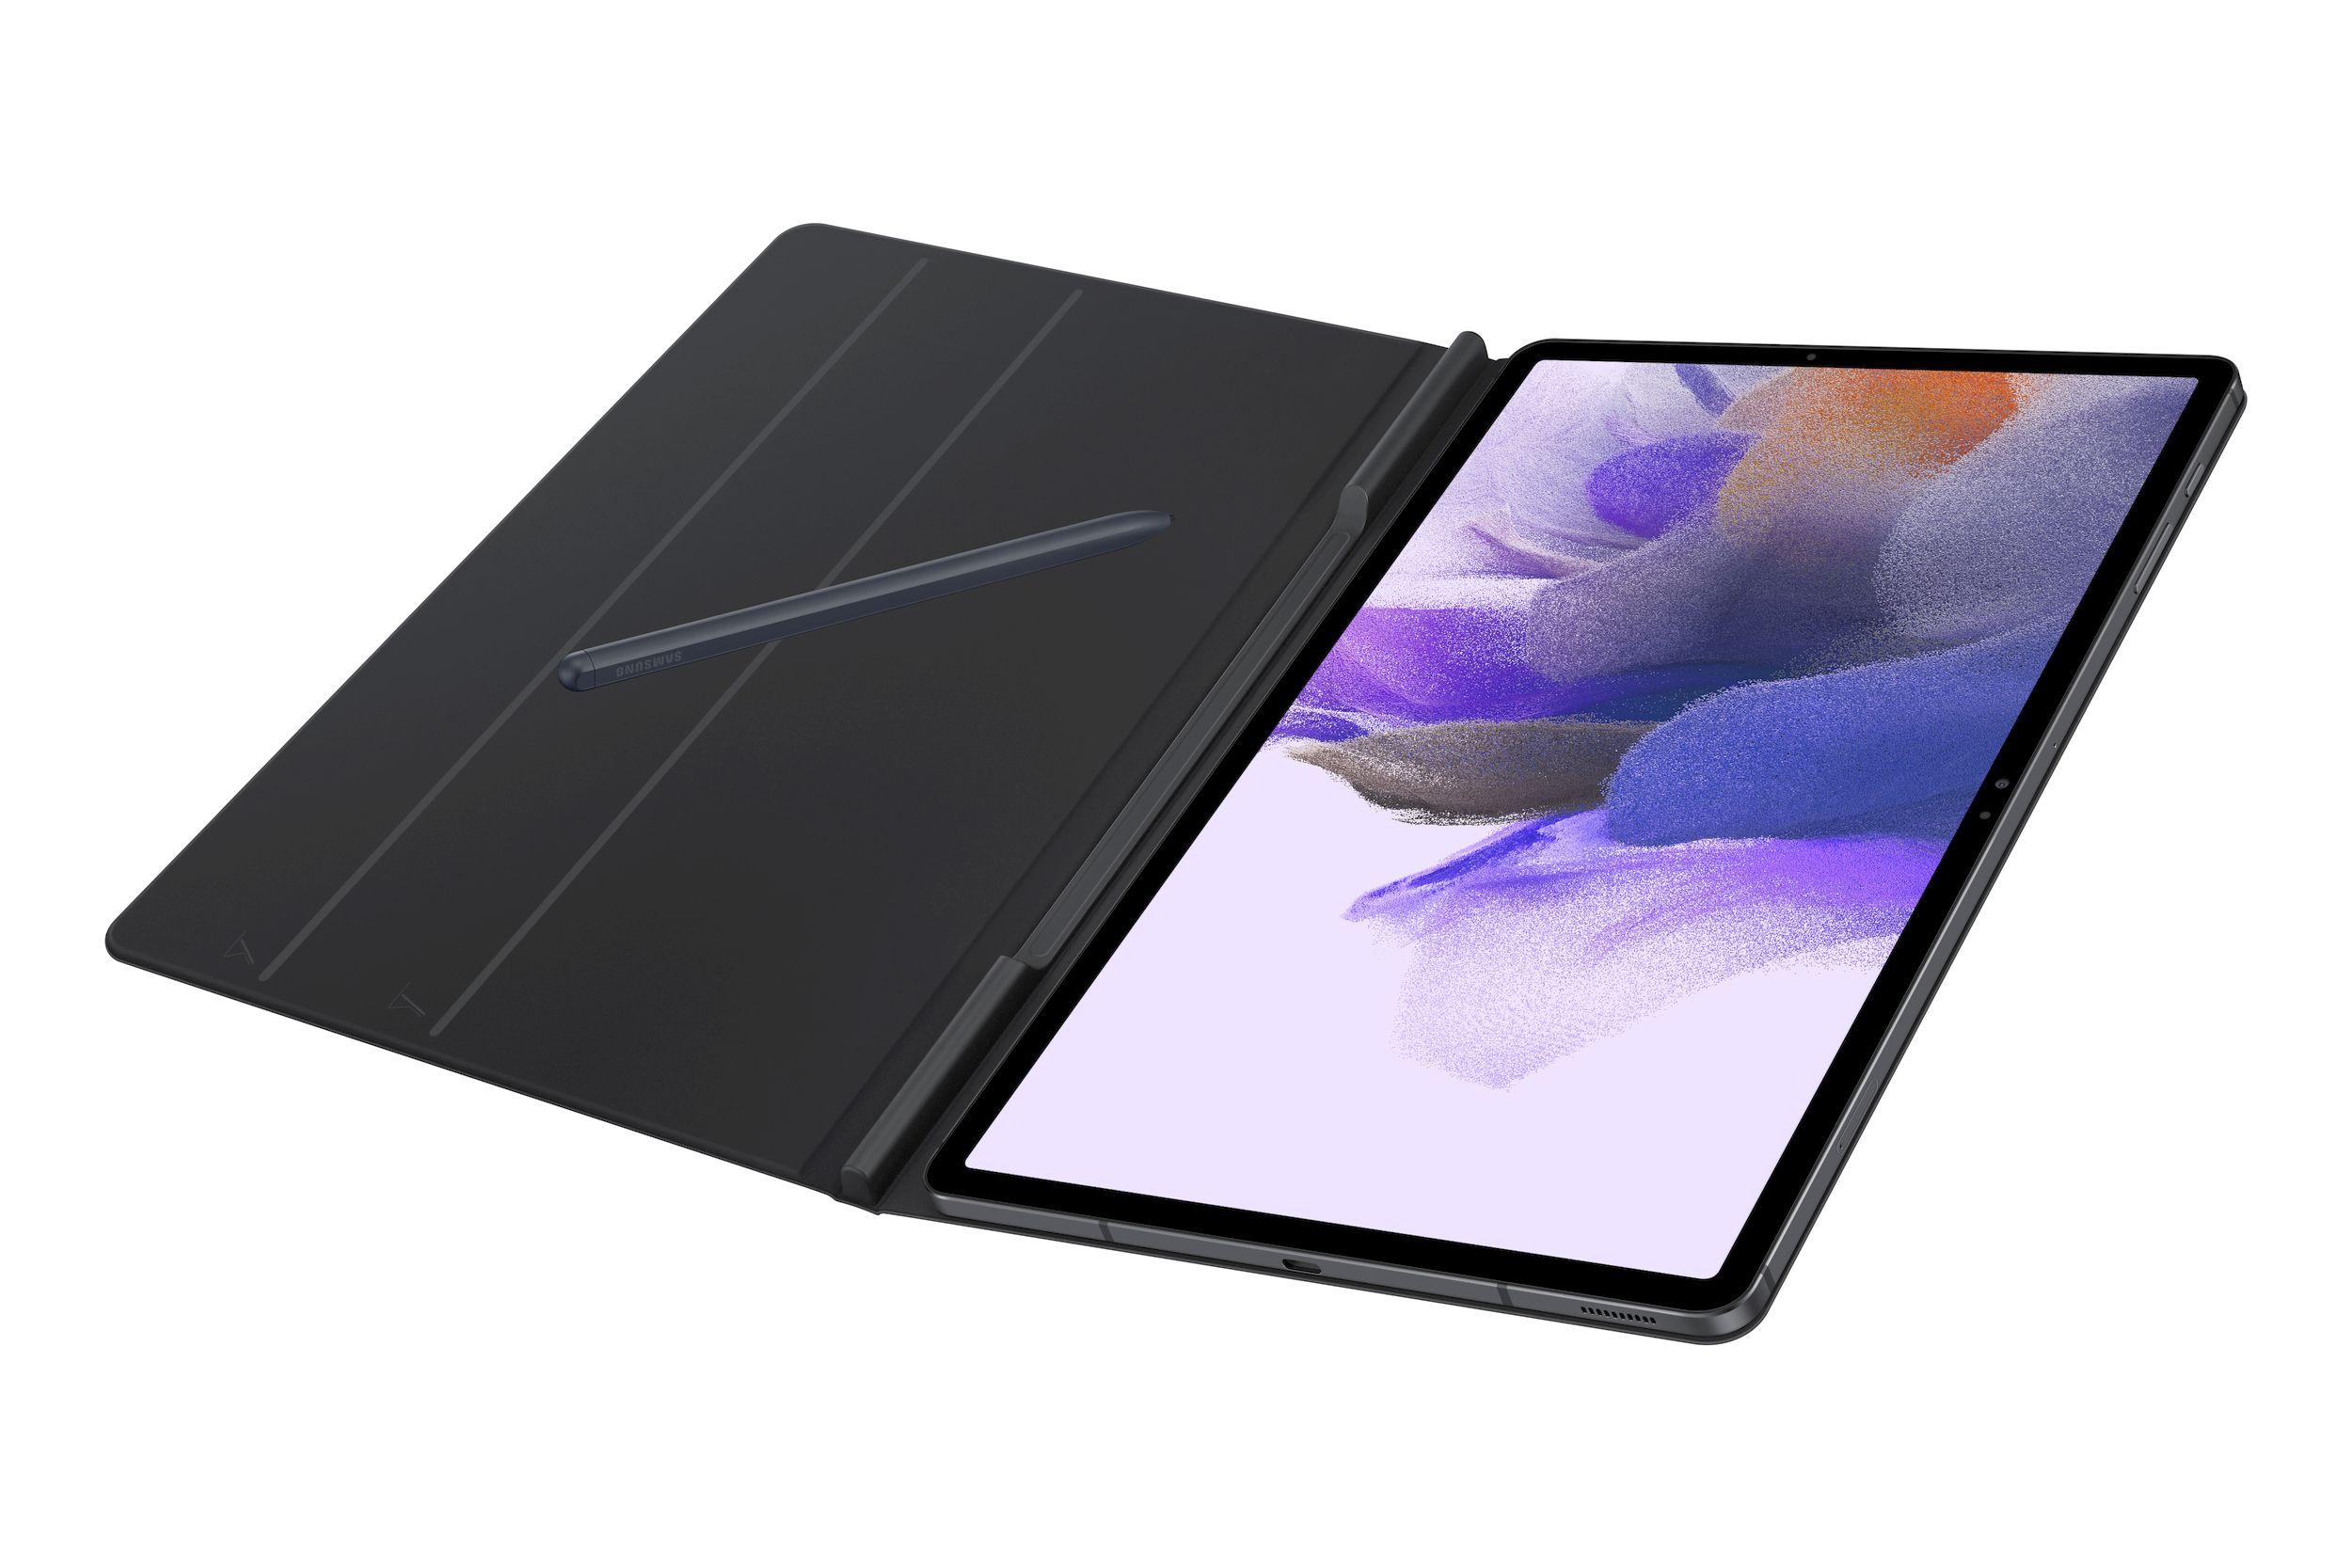 Samsung Galaxy Tab S7+ Lite в четырёх новых цветах Samsung  - samsung_galaxy_tab_s7_lite_vo_vseh_cvetah_i_rakursah_na_press_foto_picture6_0